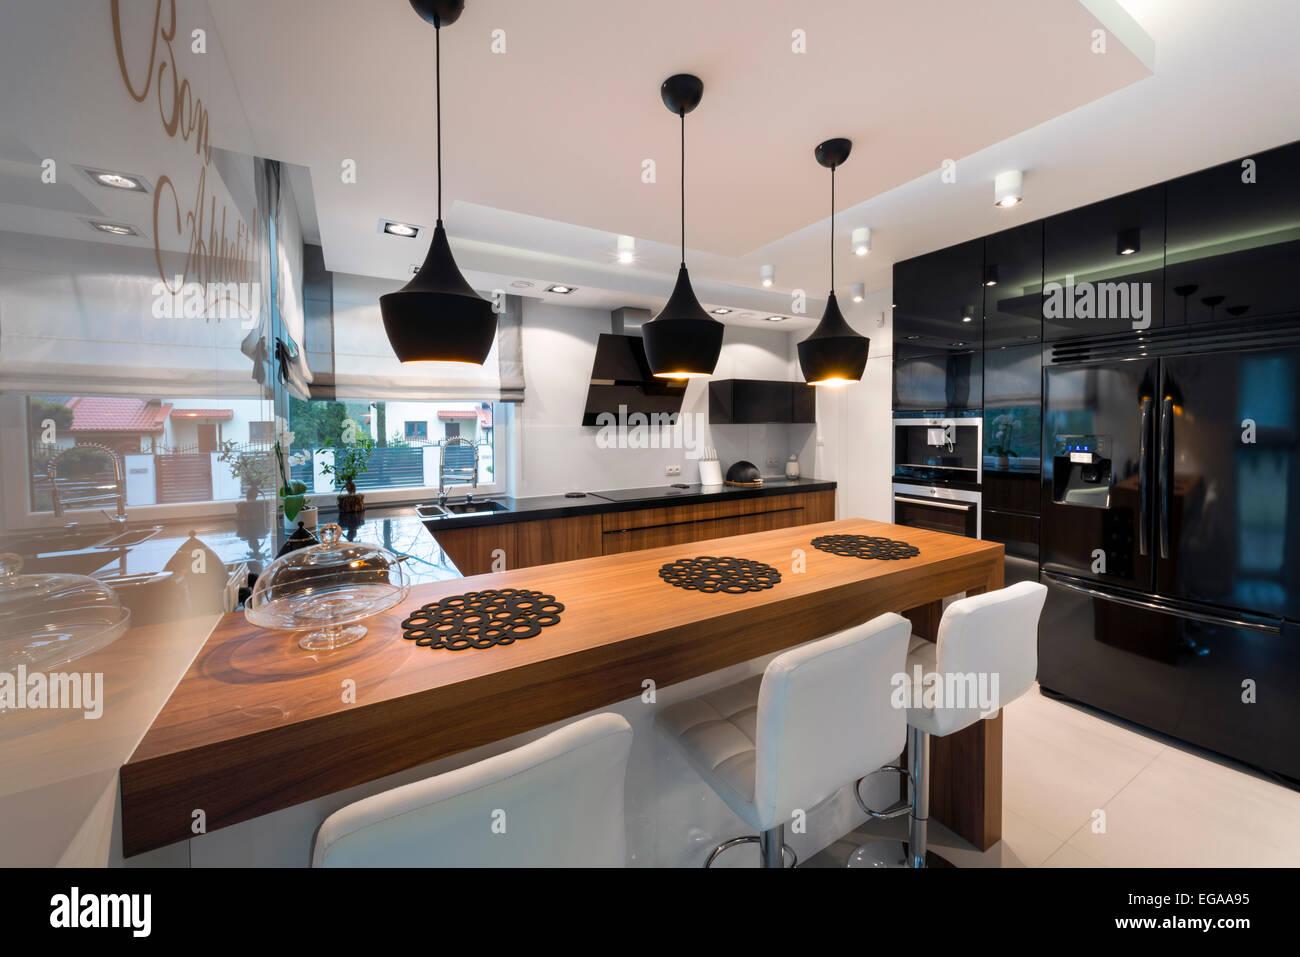 Cucina Moderna Nera E Legno Parete Attrezzata Bianca E Nera 588